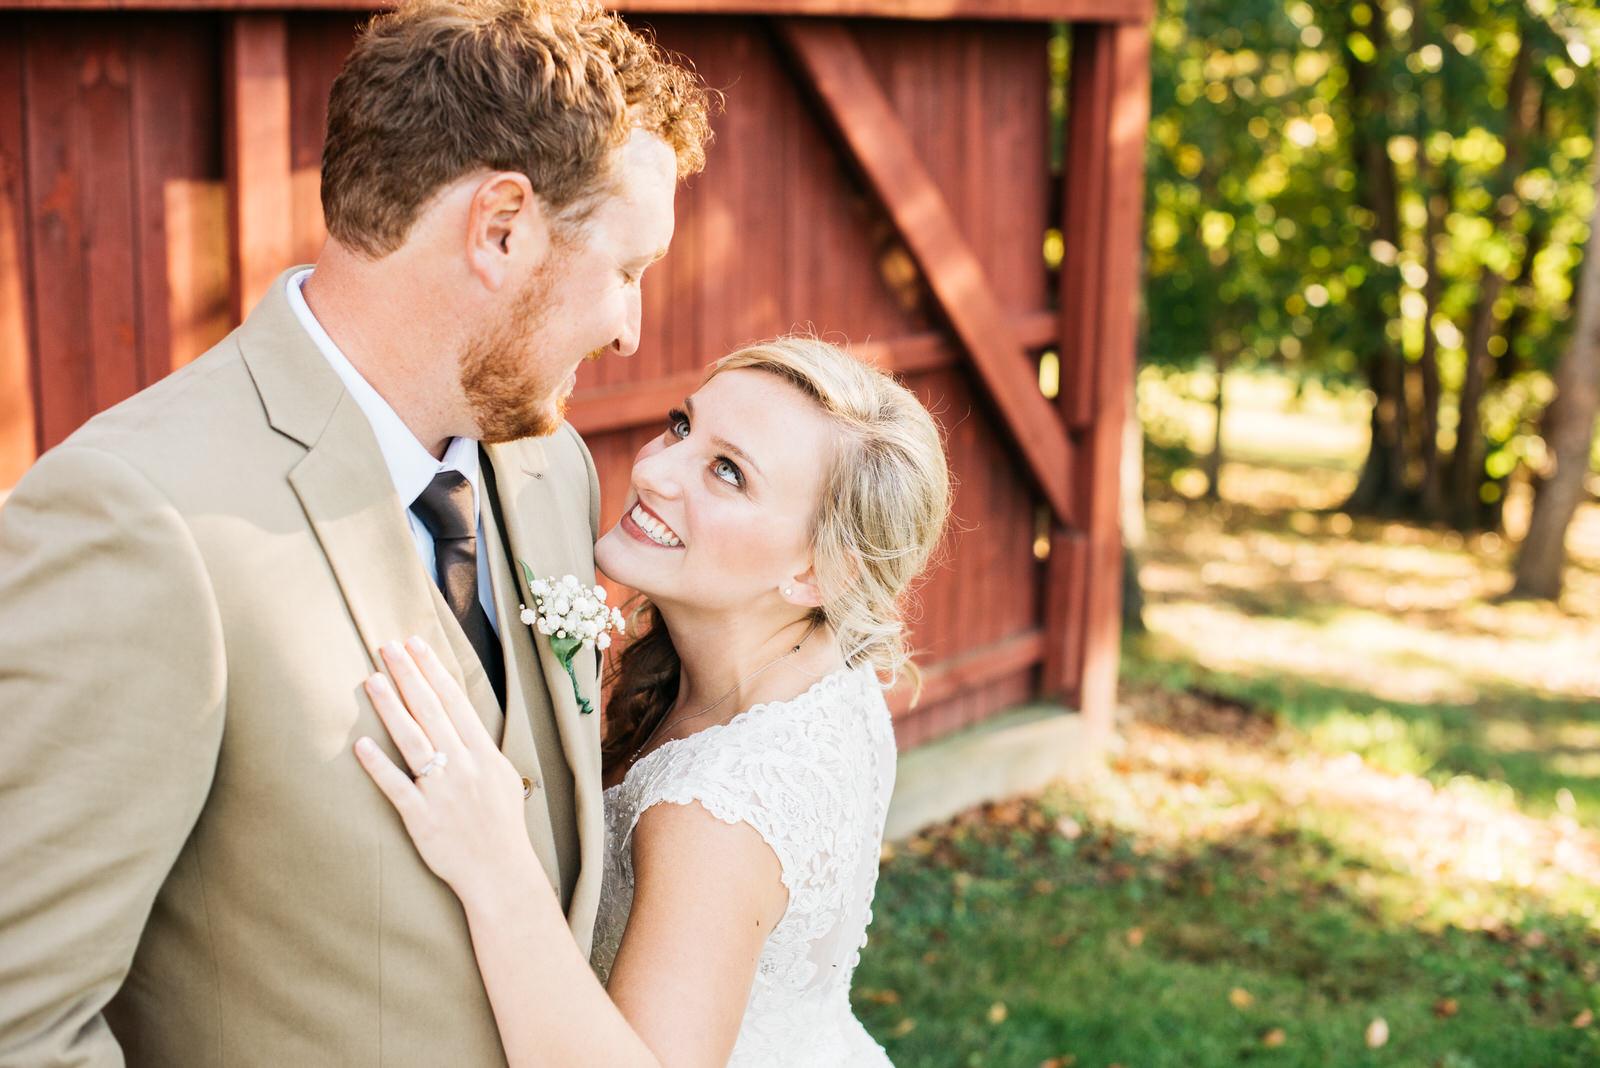 wedding_at_red_fox_winery_wedding_photographer062.jpg